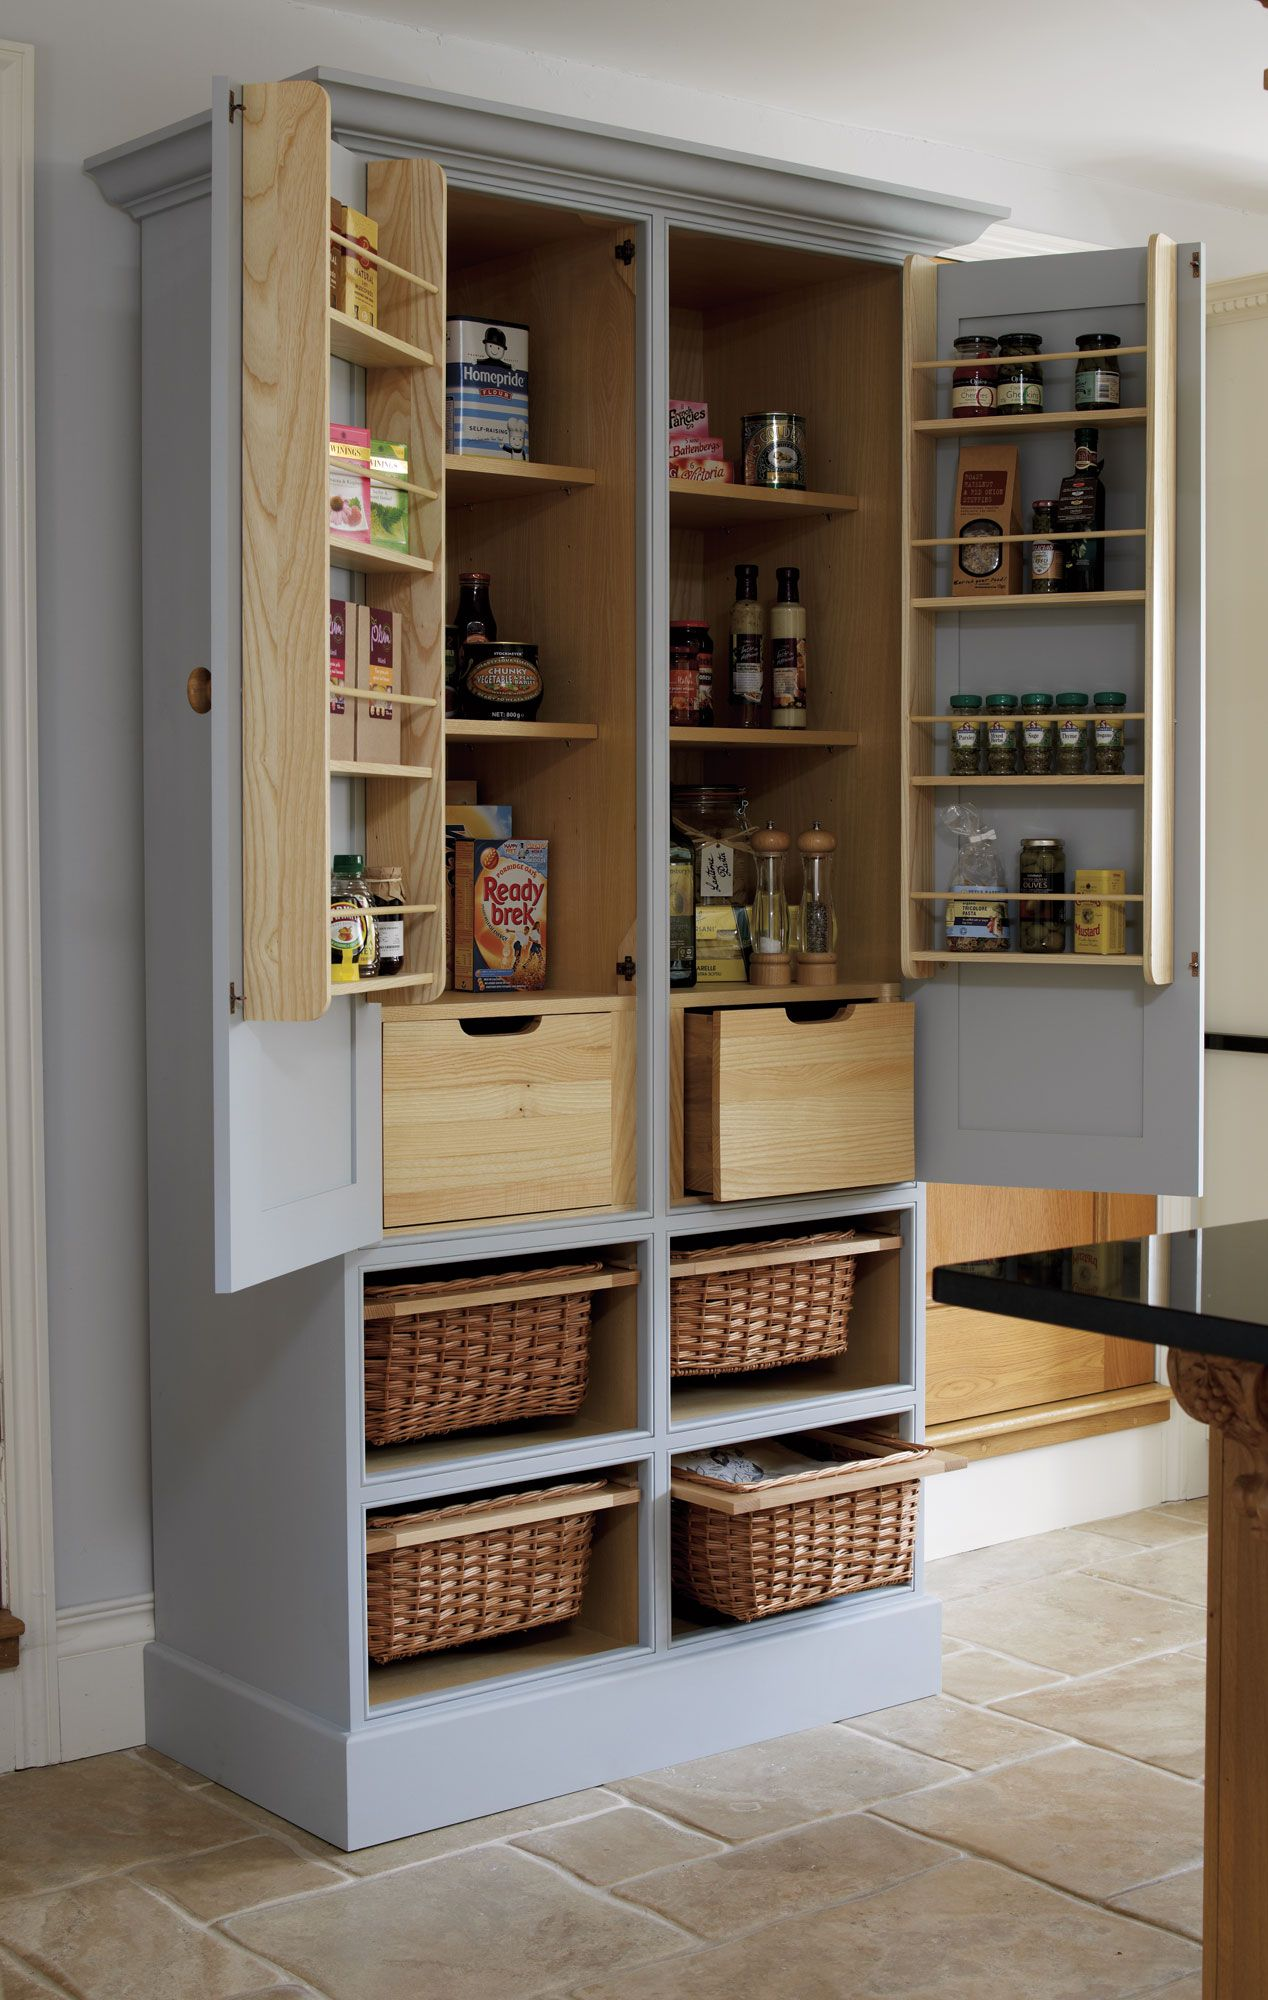 Pin By Wayne Court On Storage Ideas Kitchen Larder Kitchen Pantry